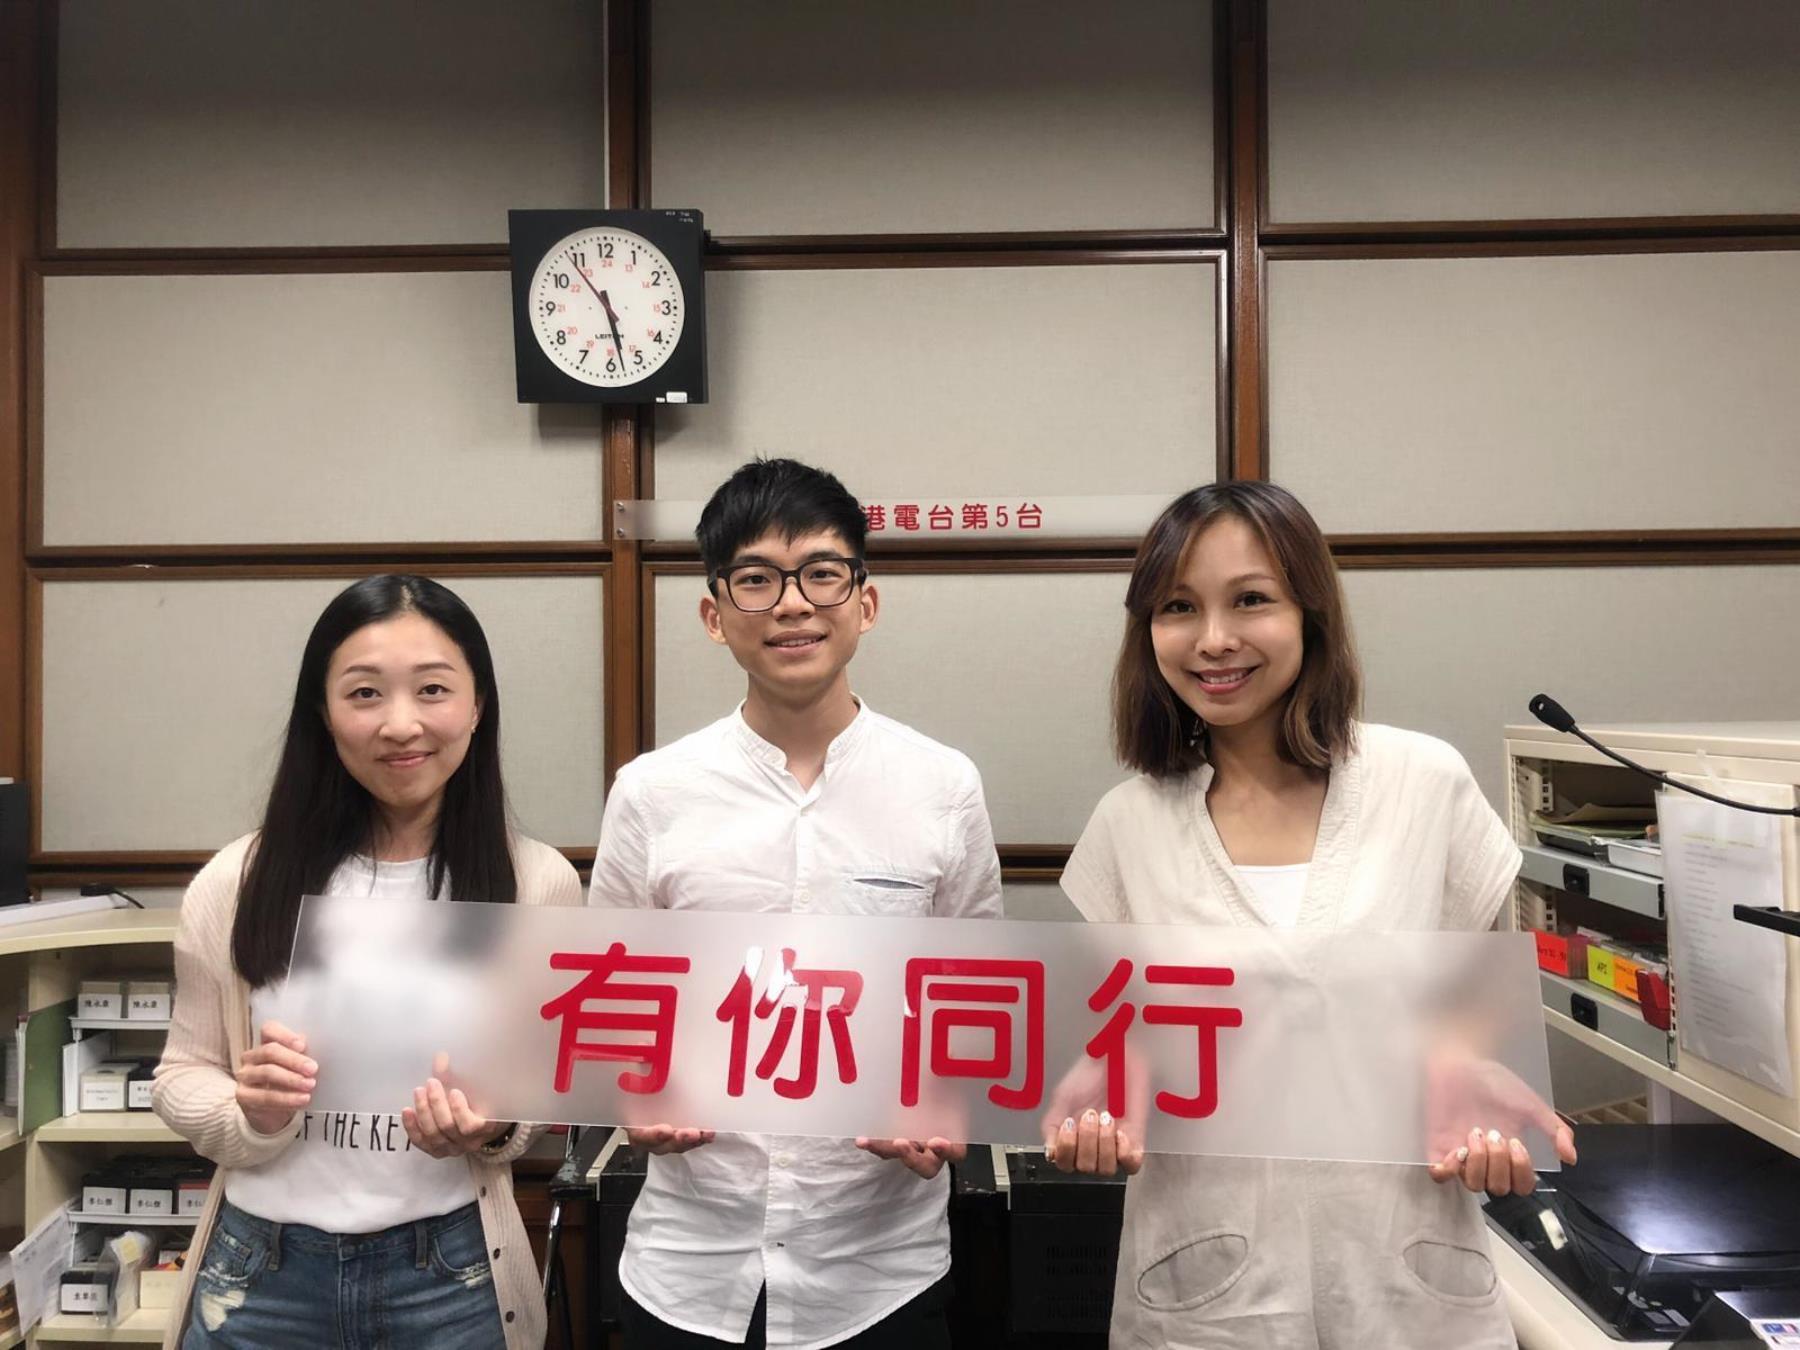 https://npc.edu.hk/sites/default/files/photo.jpeg